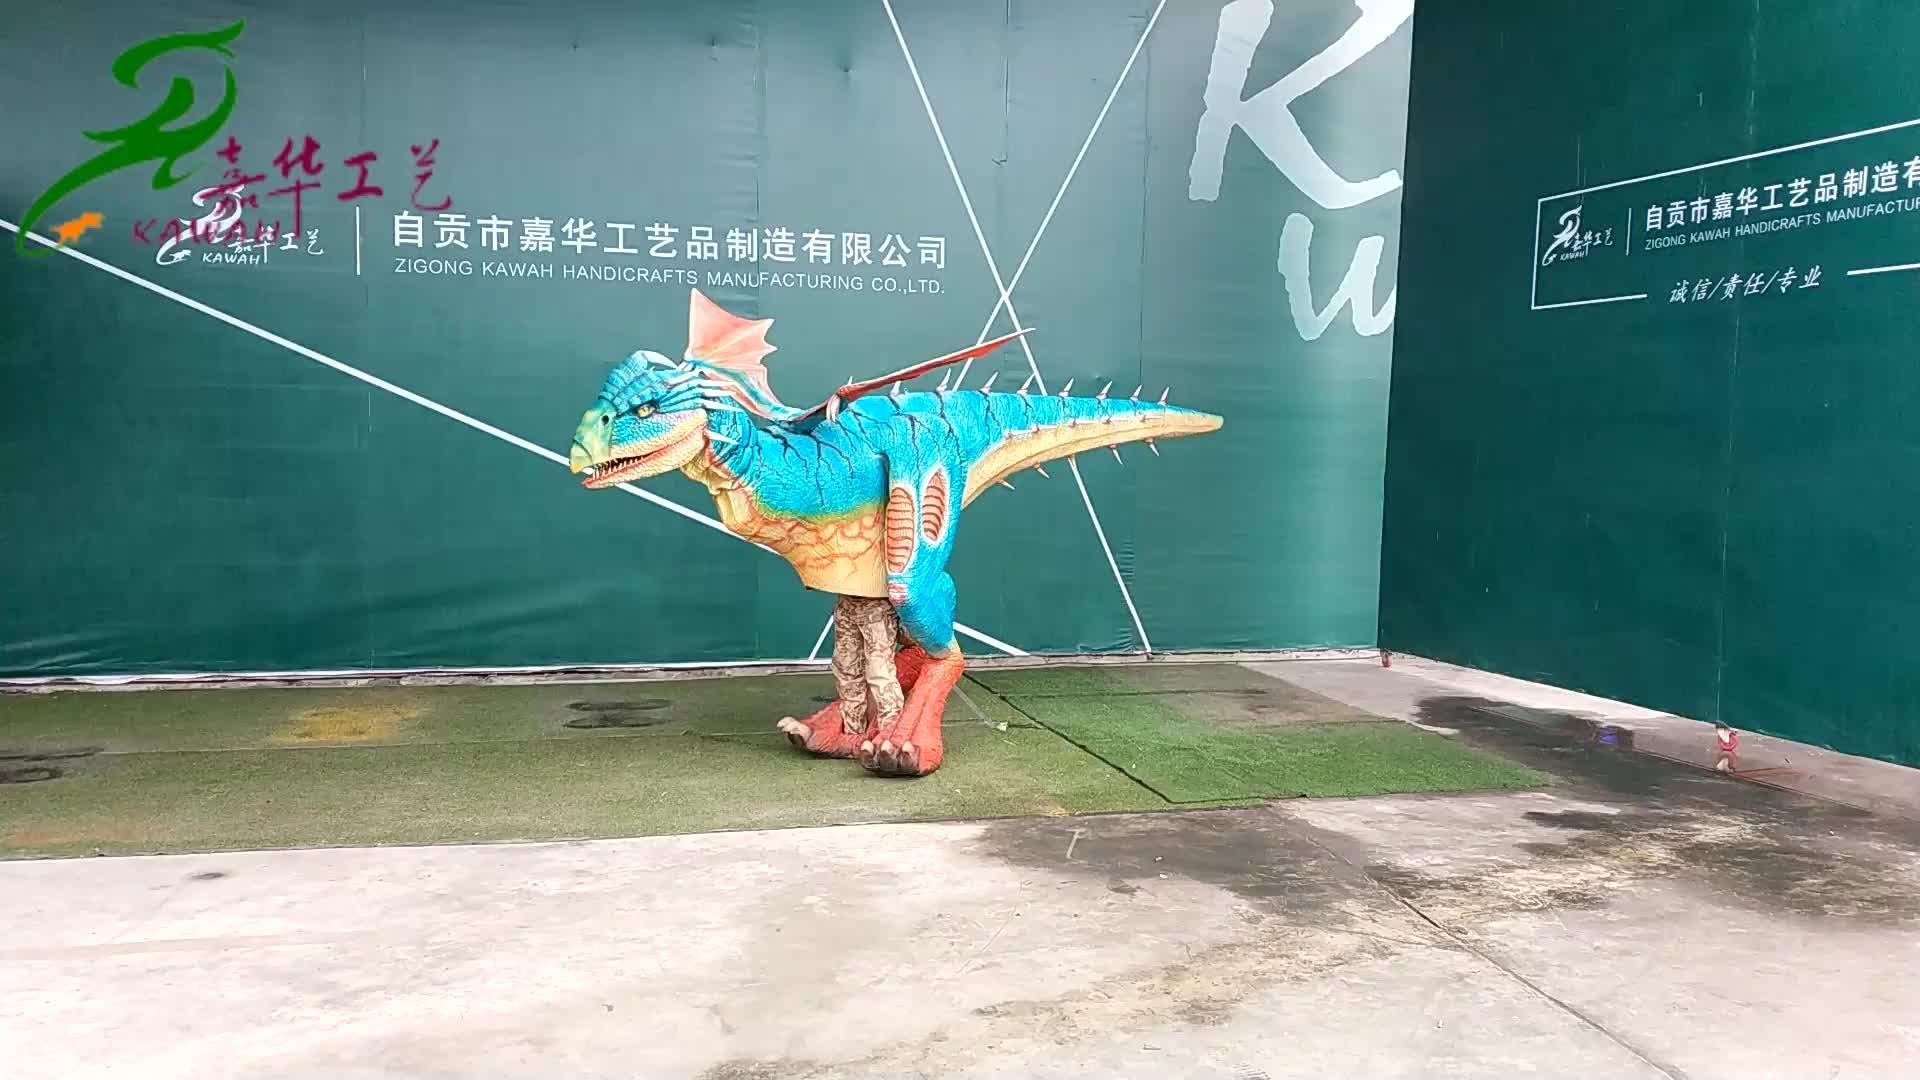 KAWAH จูราสสิคเหมือนจริงสมจริง Walking T rex เครื่องแต่งกายไดโนเสาร์ในสหรัฐอเมริกา